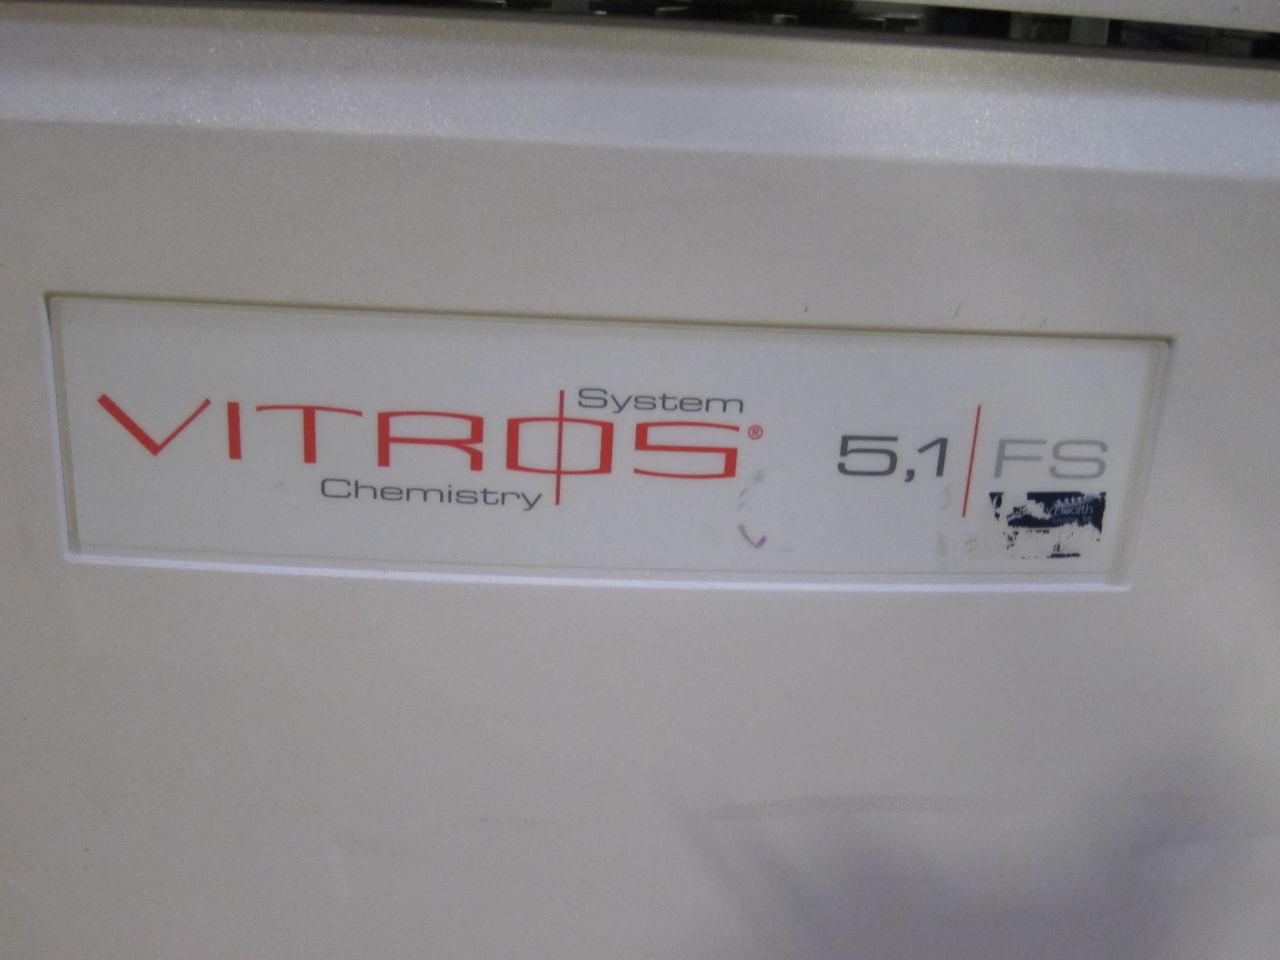 ORTHO CLINICAL DIAGNOSTICS VITROS 5,1 FS Chemistry Analyzer